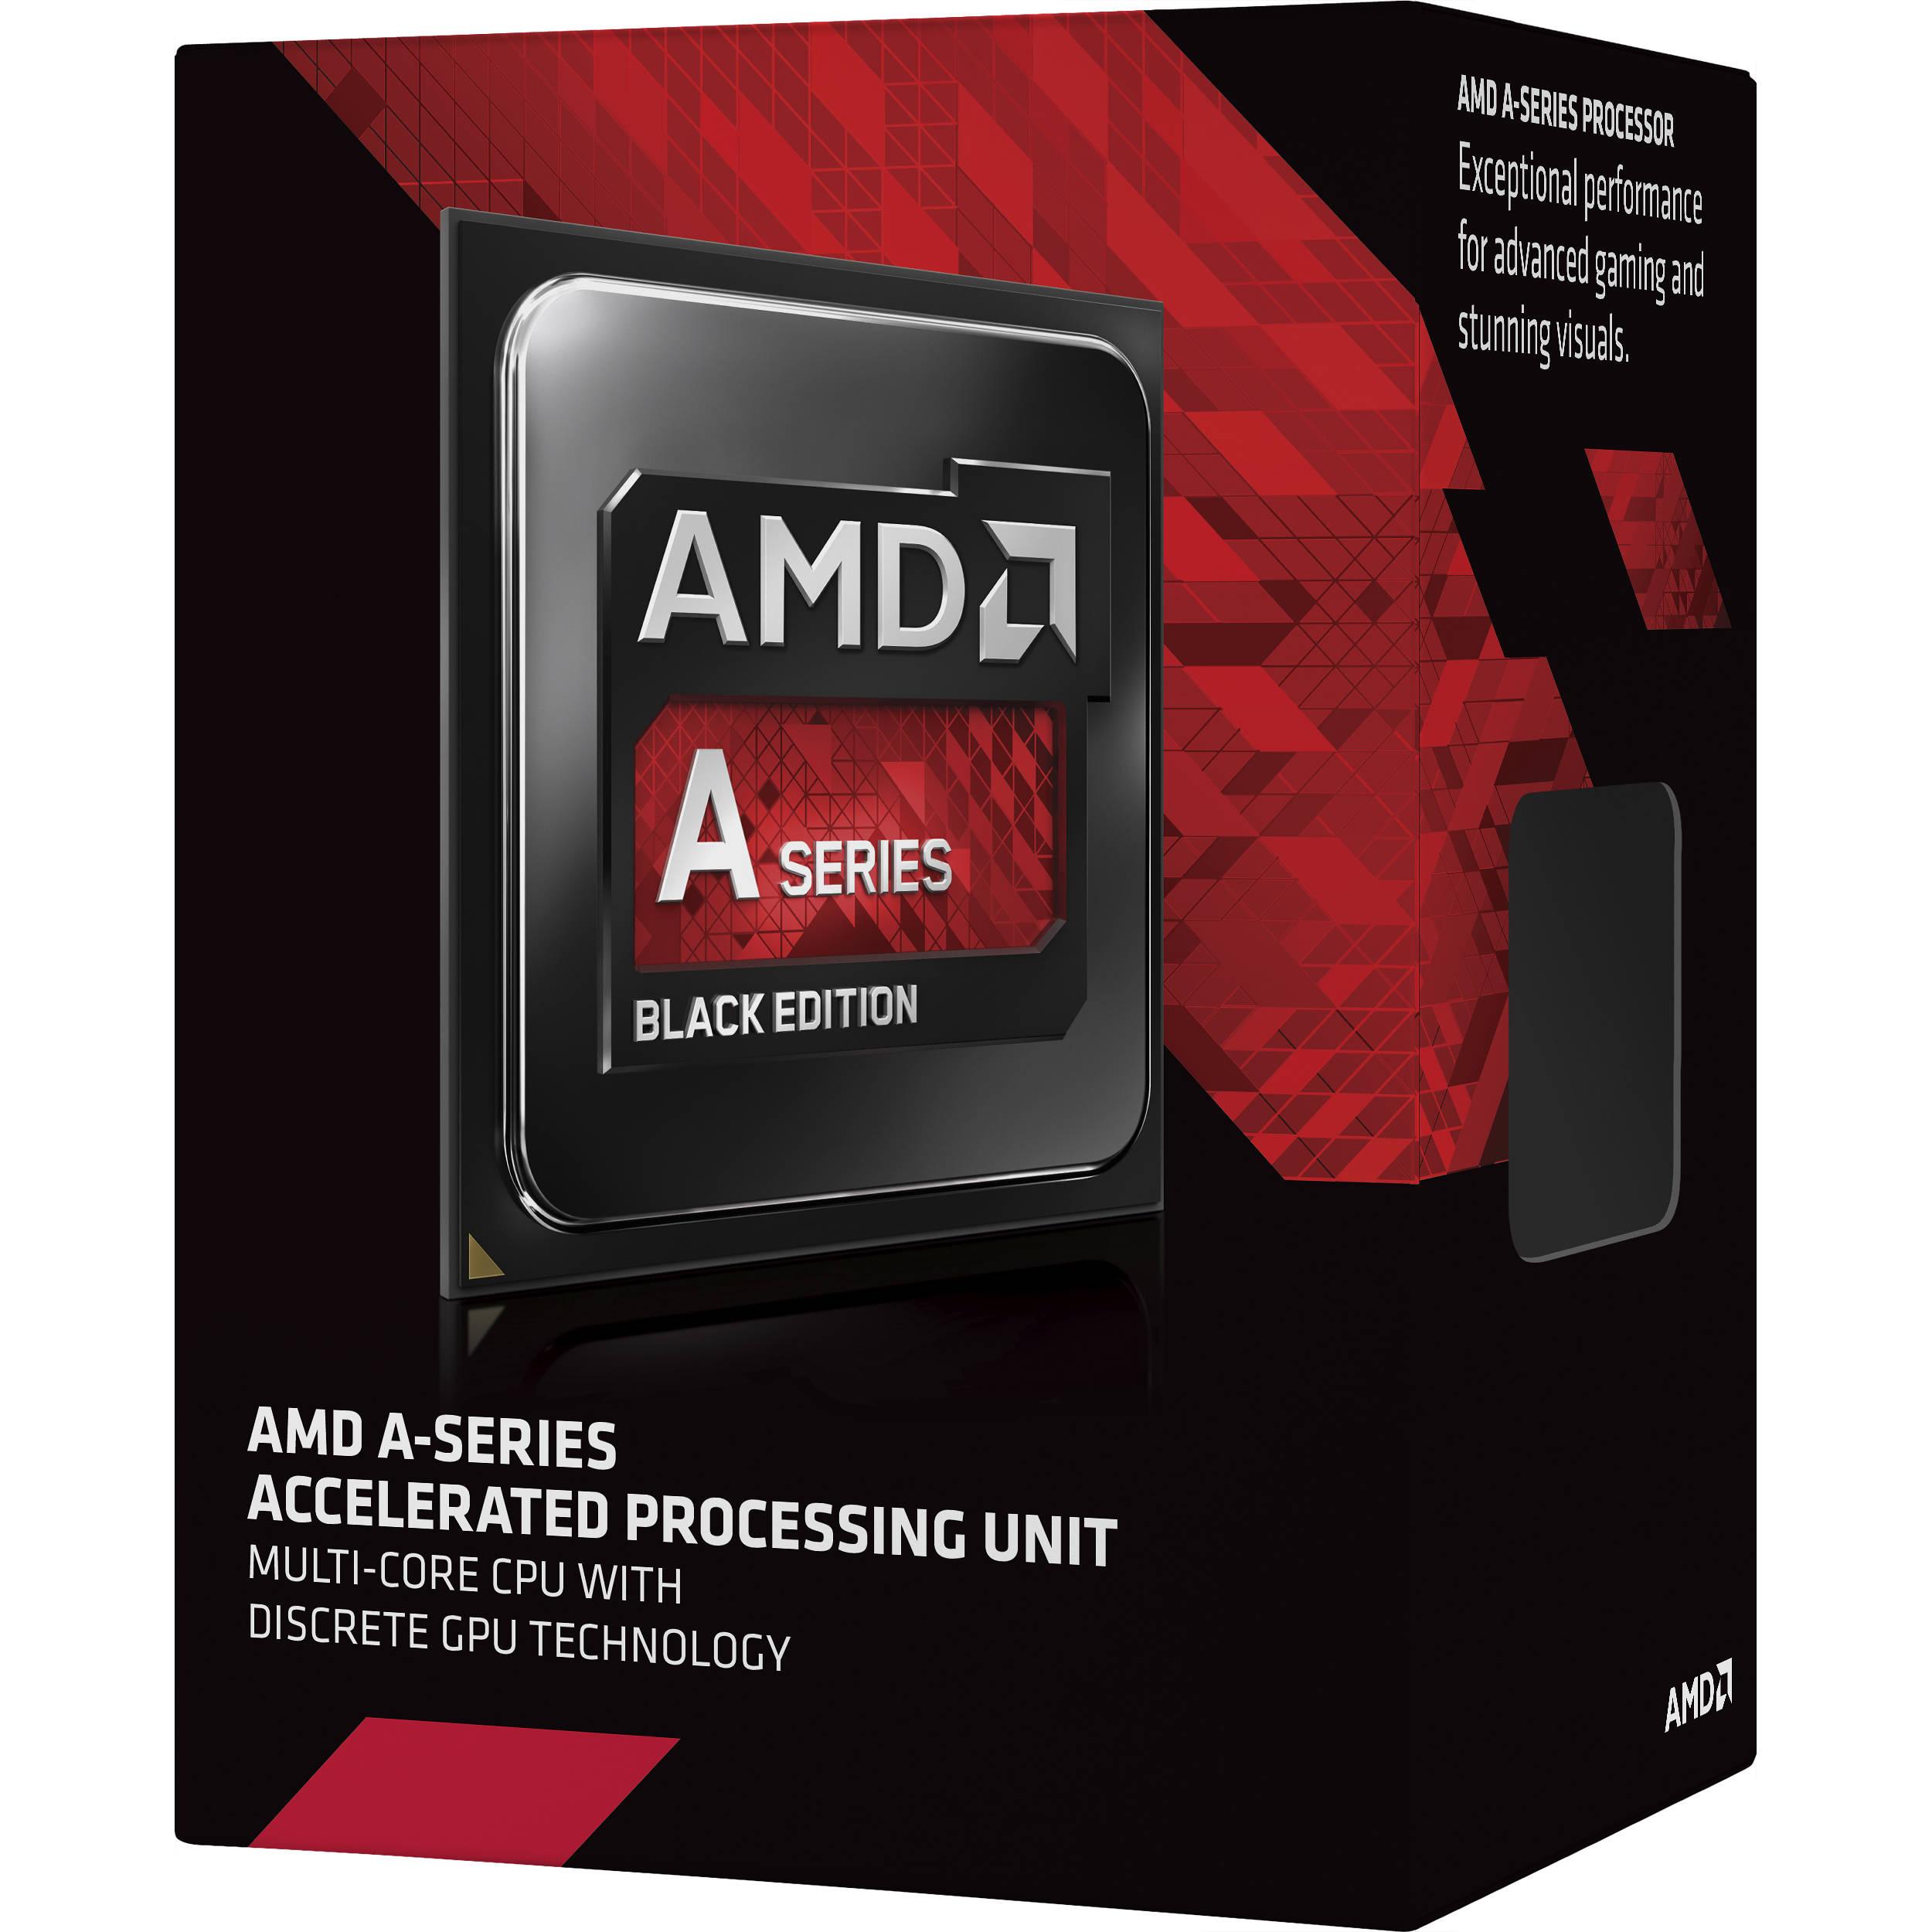 AMD A10-7700K 3 4 GHz Quad-Core FM2+ Processor